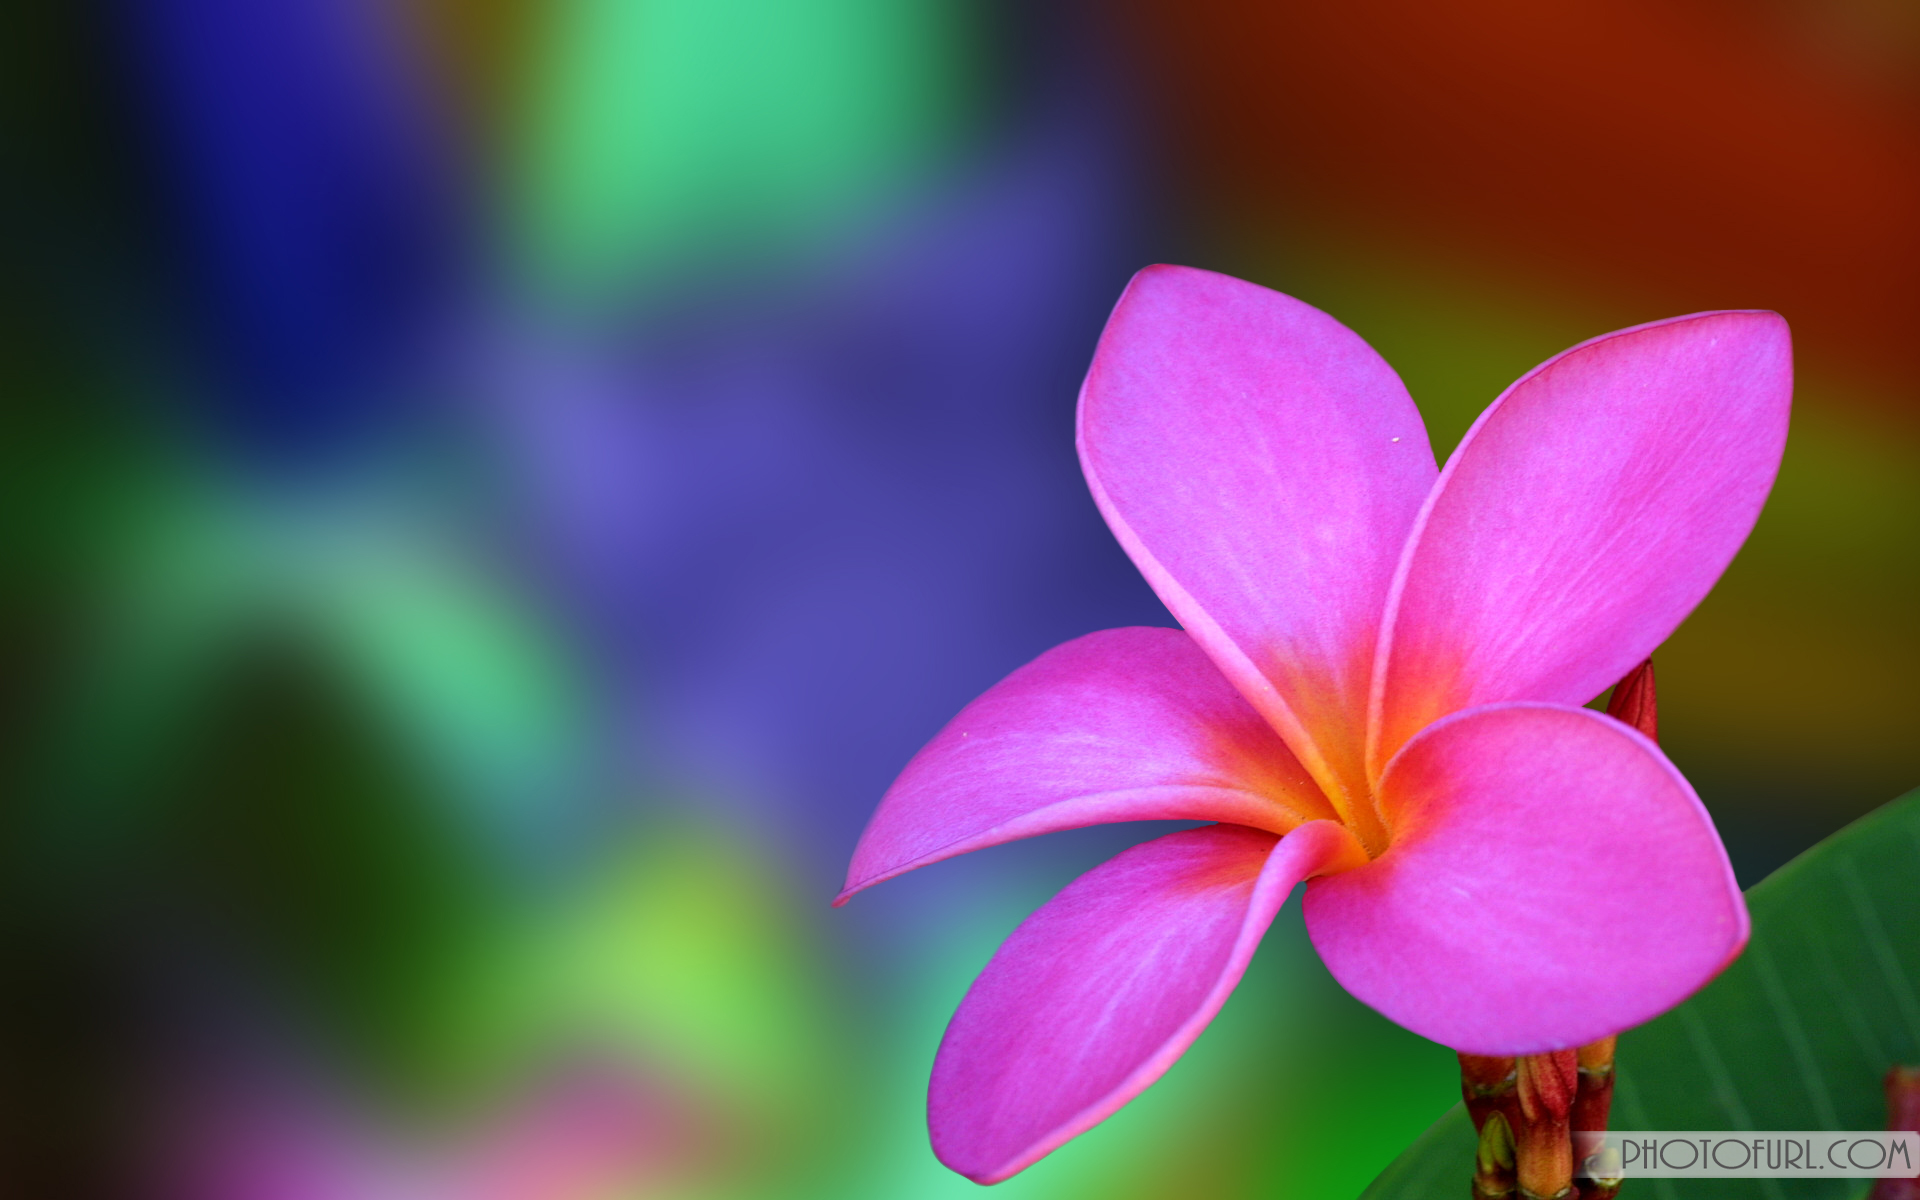 Free Download Screen Wallpaper Flower Computer Scenery Wallpapers